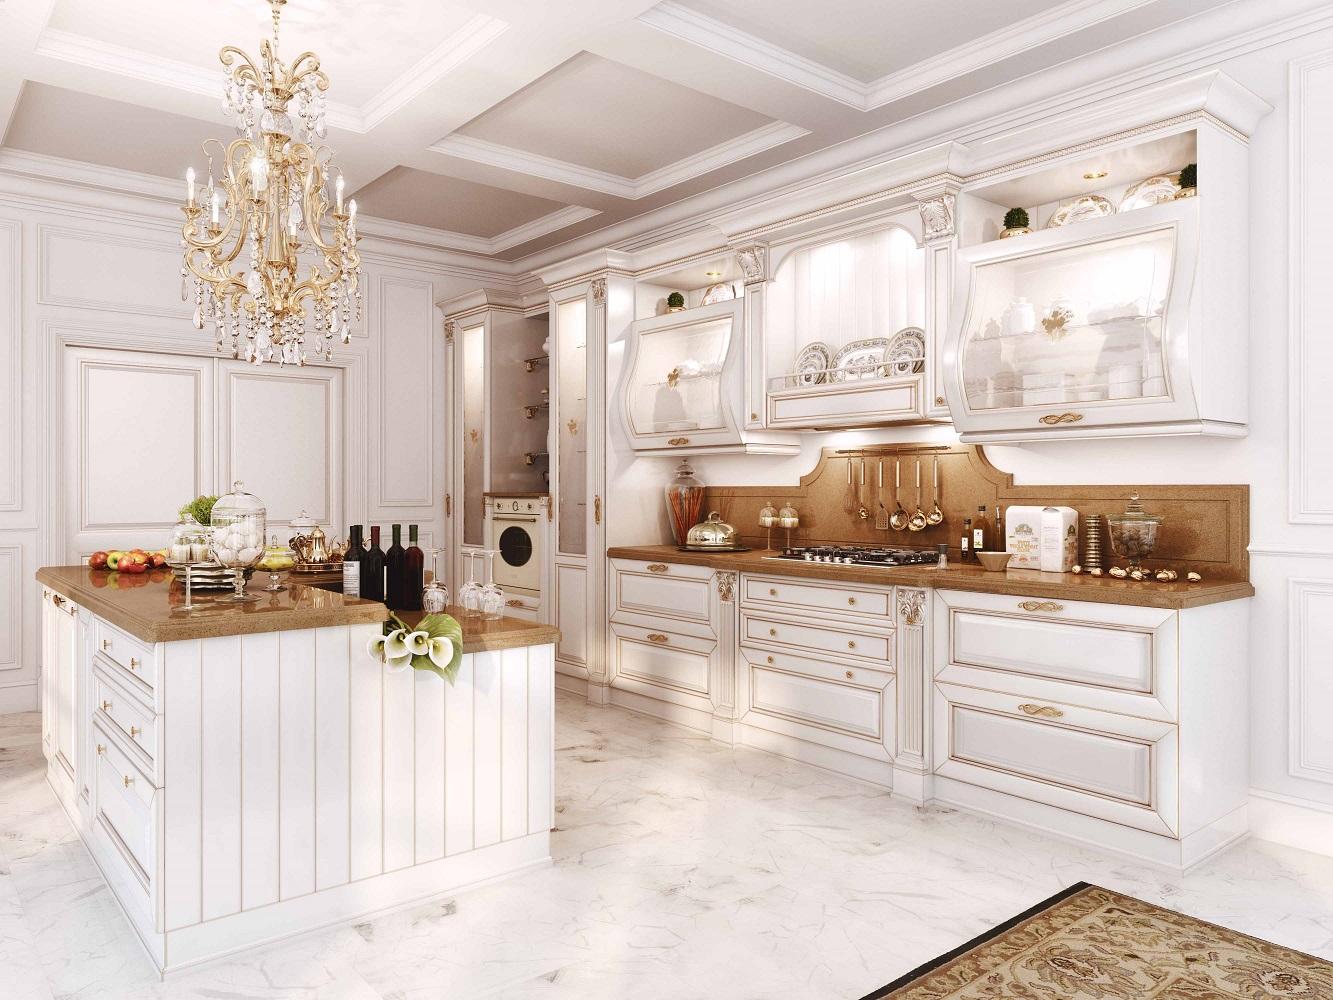 Итальянские кухни классика фото